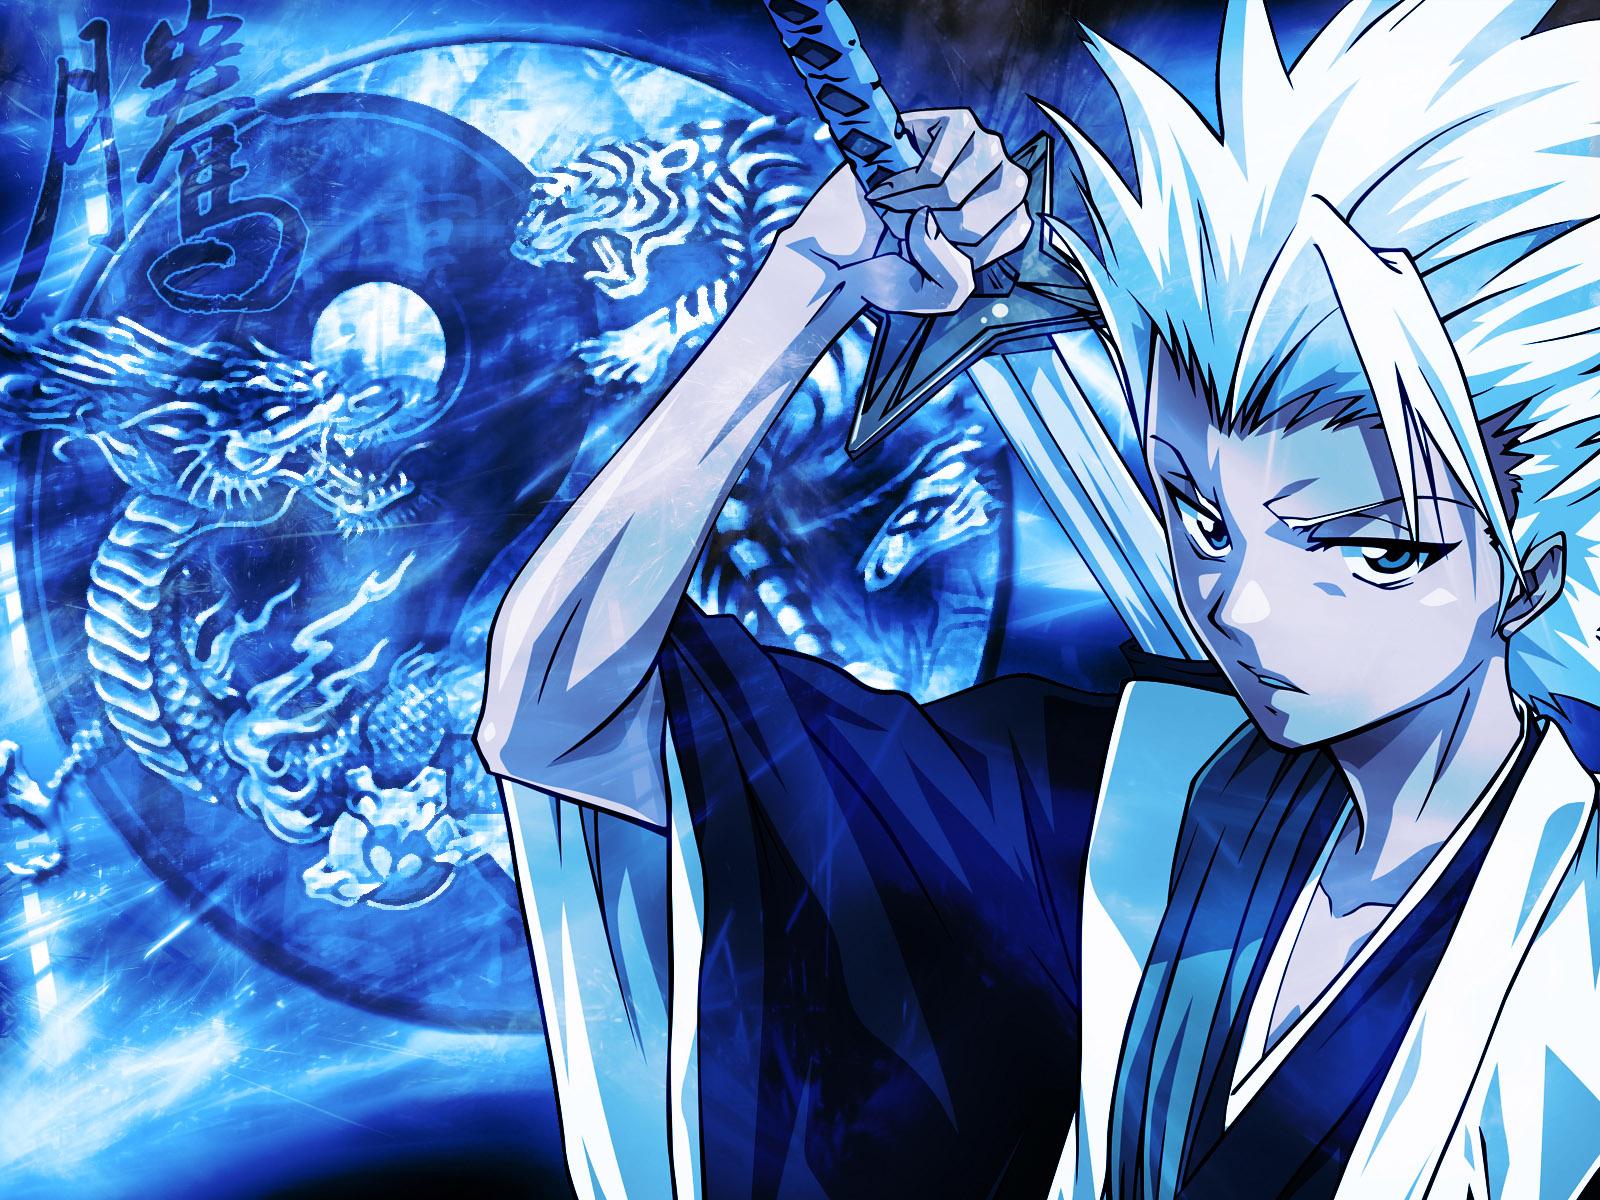 Anjo azul 4k hd wallpaper - Hitsugaya Toushirou